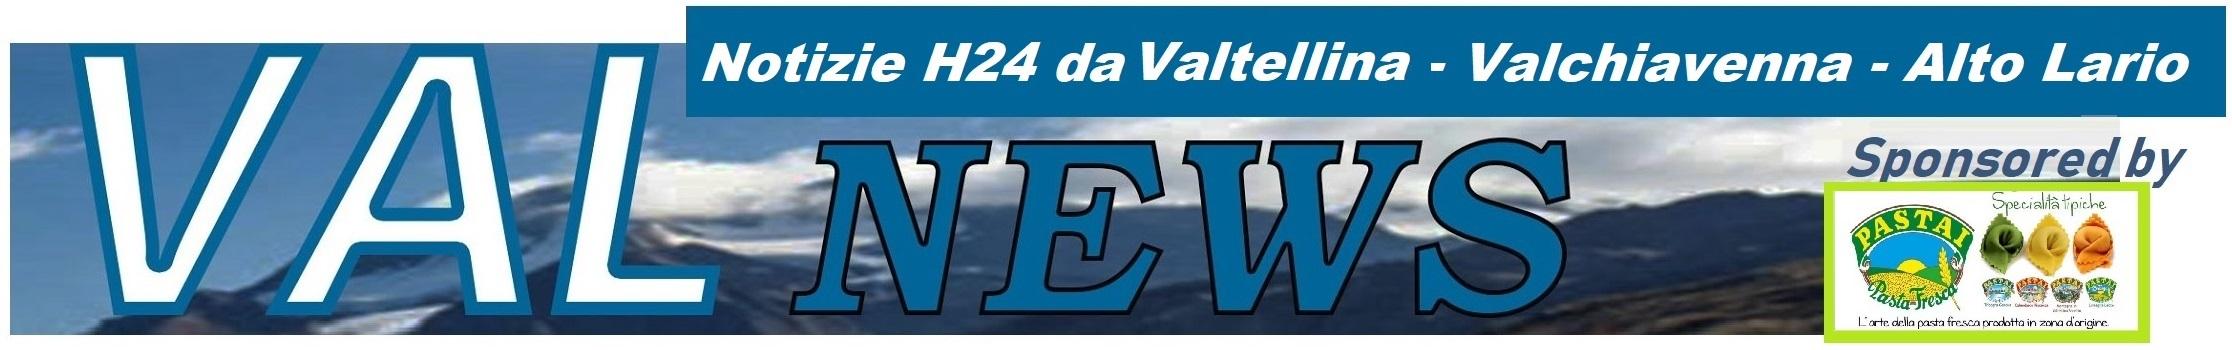 VAL news - Notizie dalla Valtellina, Valchiavenna e Alto Lario. Edita da VALNEWS S.R.L.